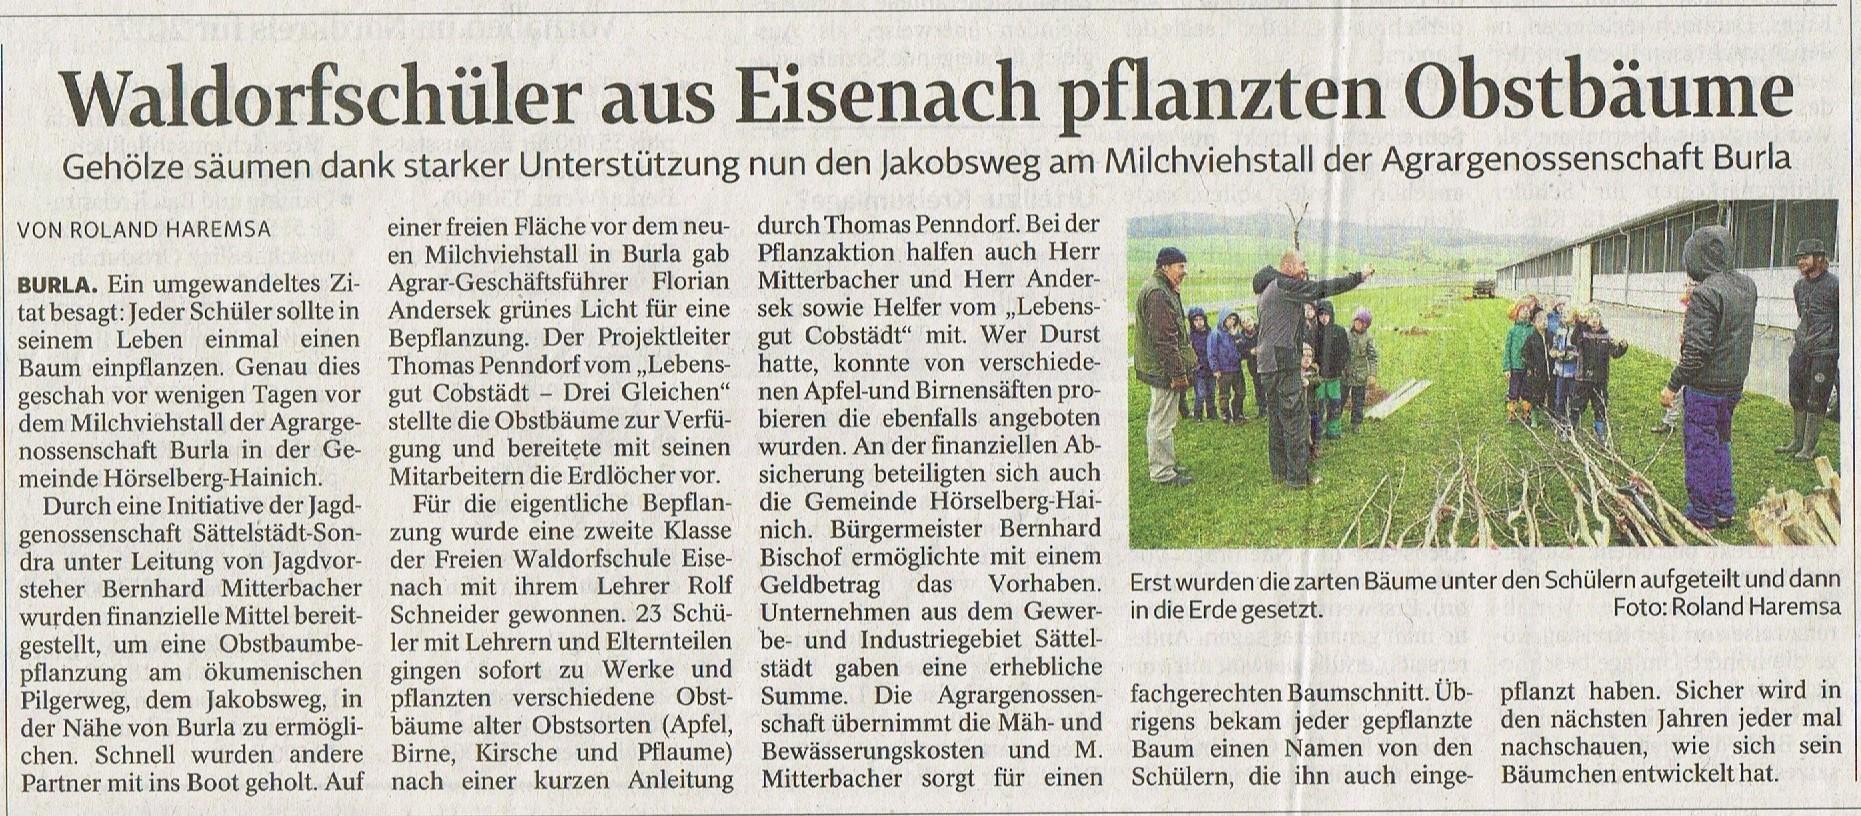 Waldorfschüler aus Eisenach pflanzten Obstbäume (2016)